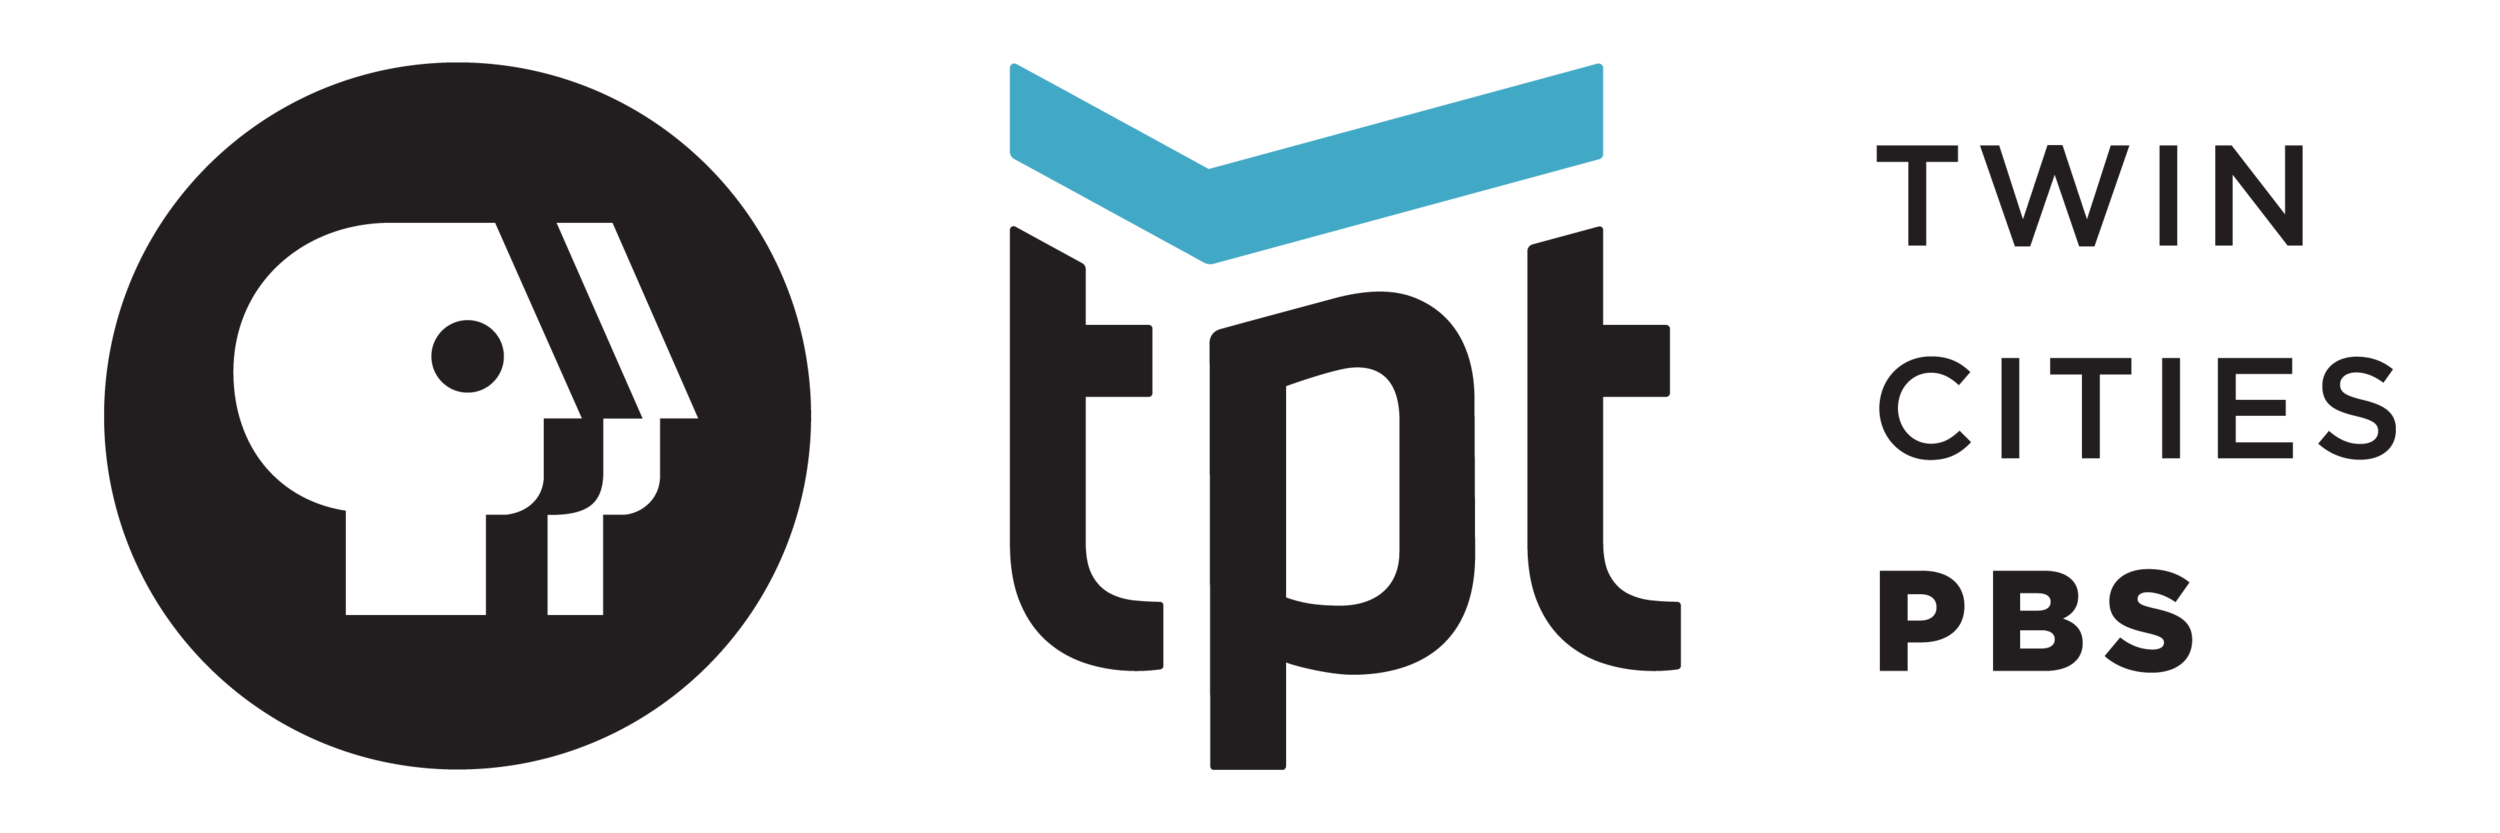 TPT_PBS_RGB_Desc.png